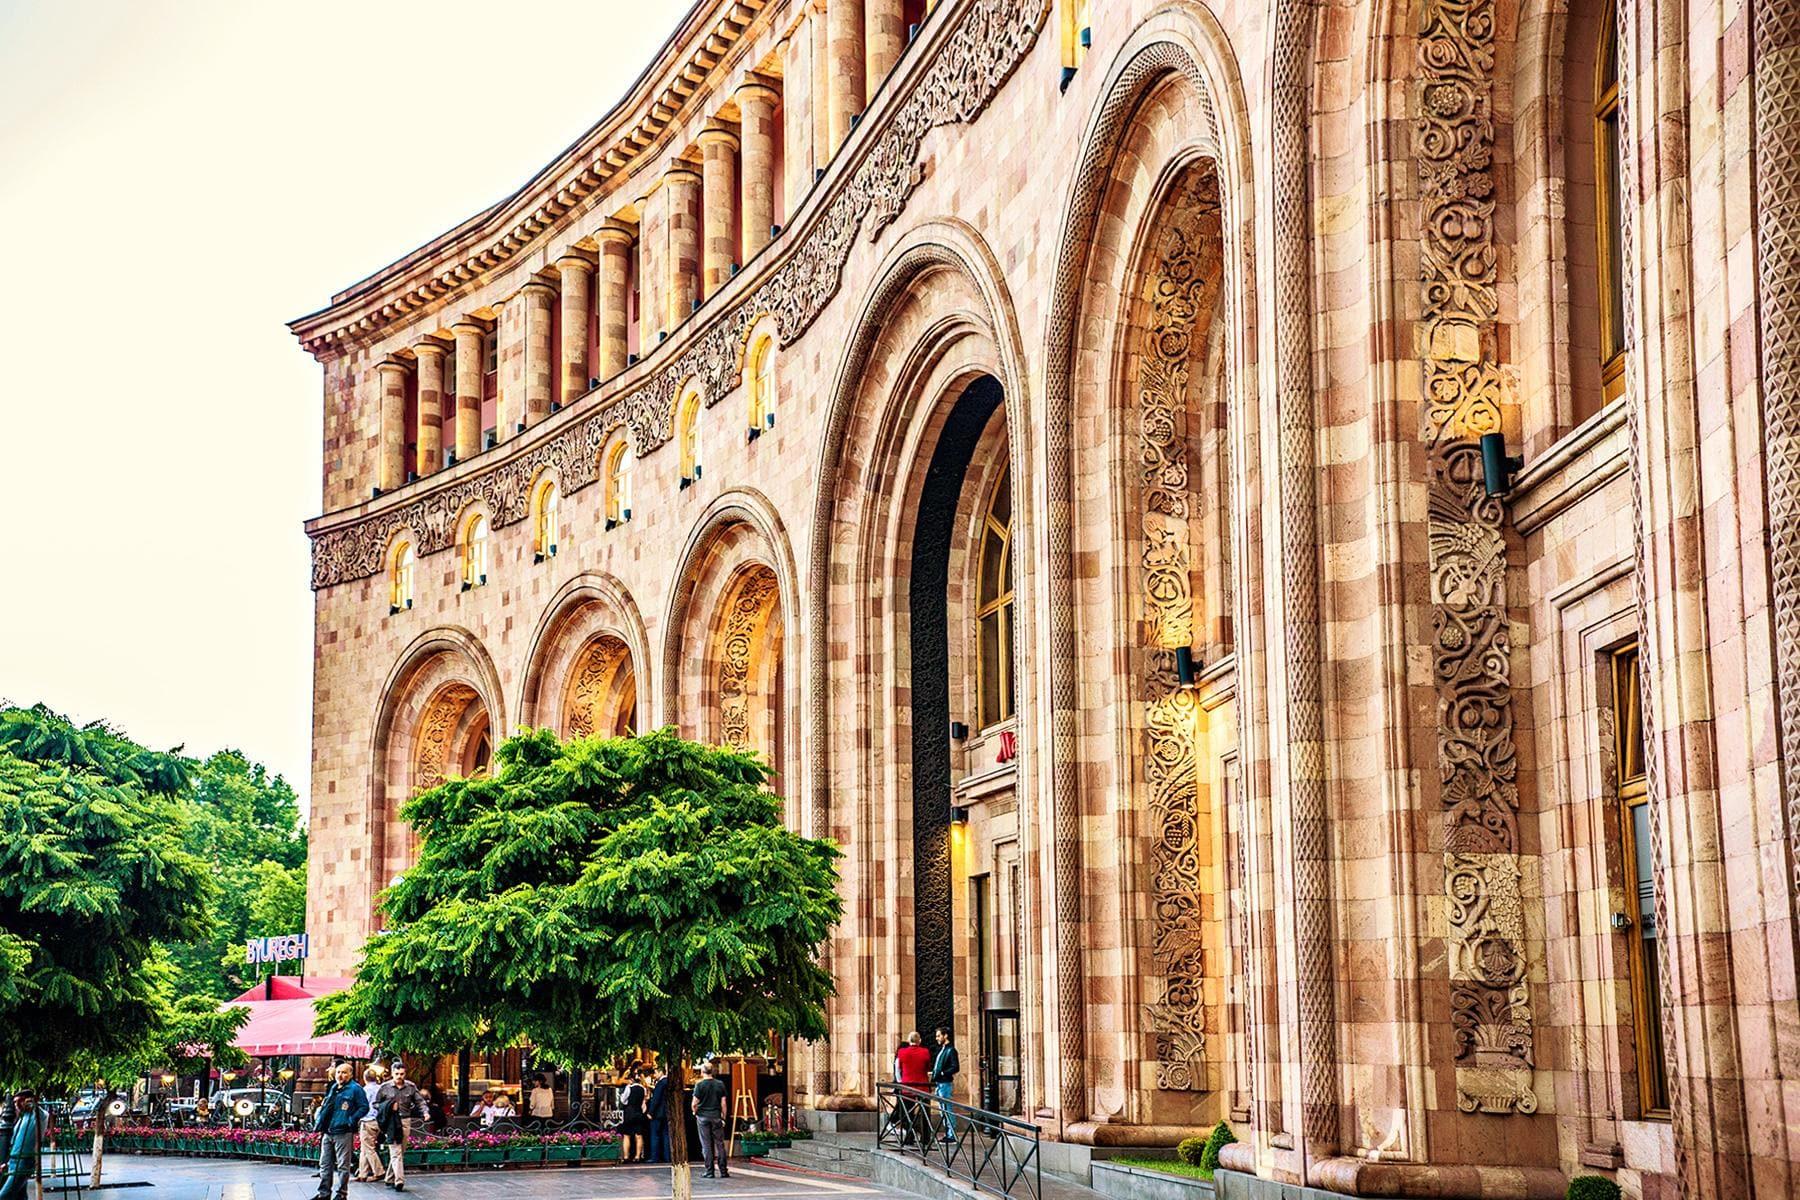 12_YervanArmenia_Hotels_shutterstock_1110207533_1